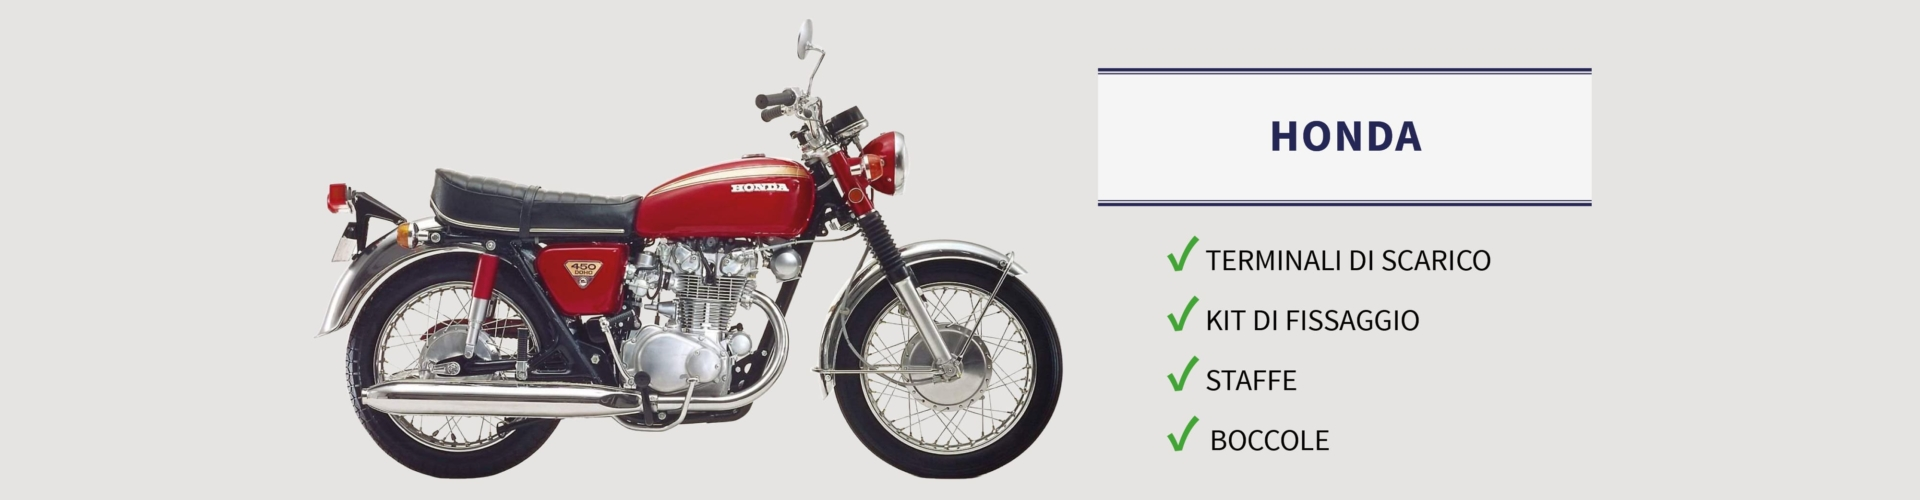 moto-storiche-italiane-terminali-moto-epoca-honda-four-450-rid